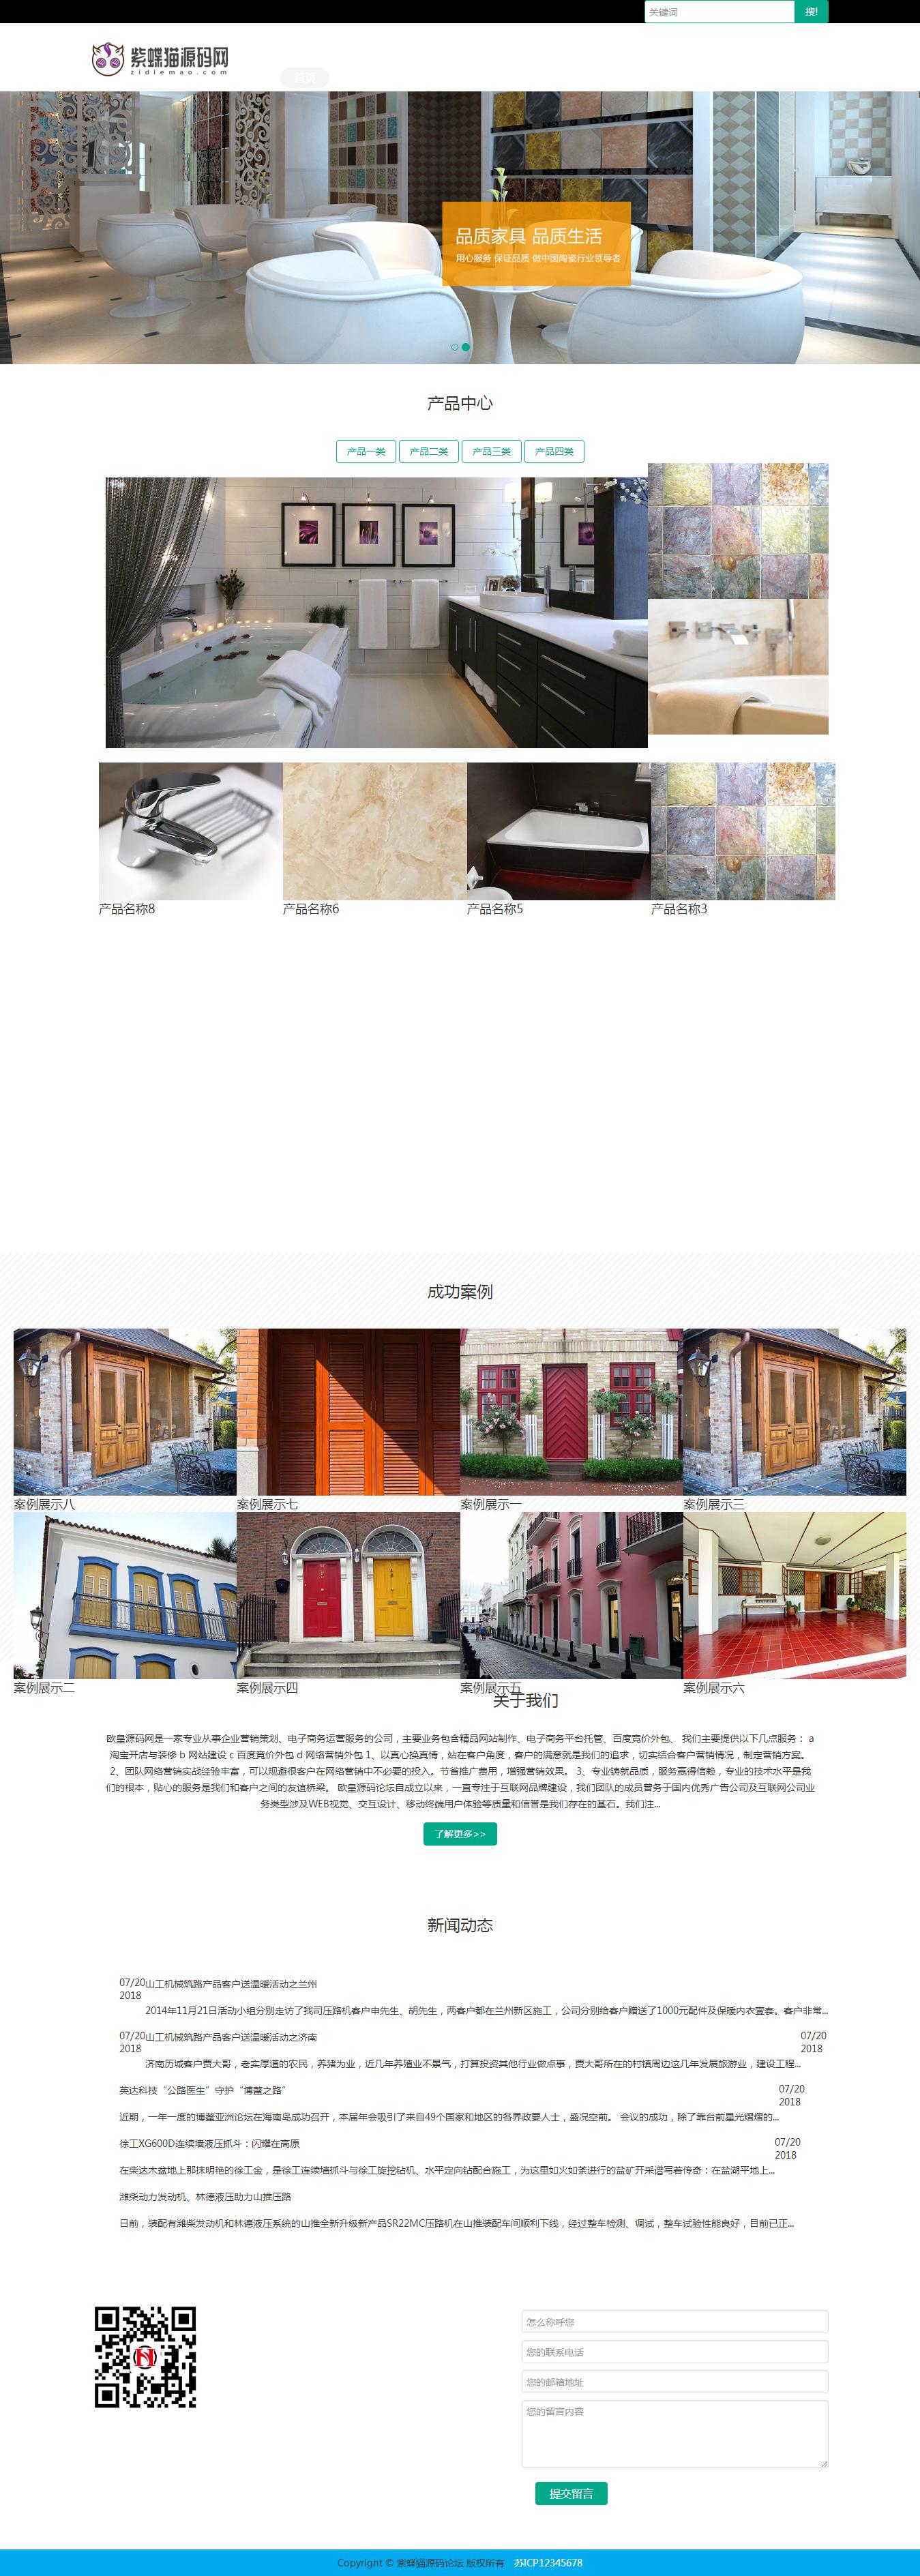 D67织梦dede模板源码黑色建材网站模板含手机版